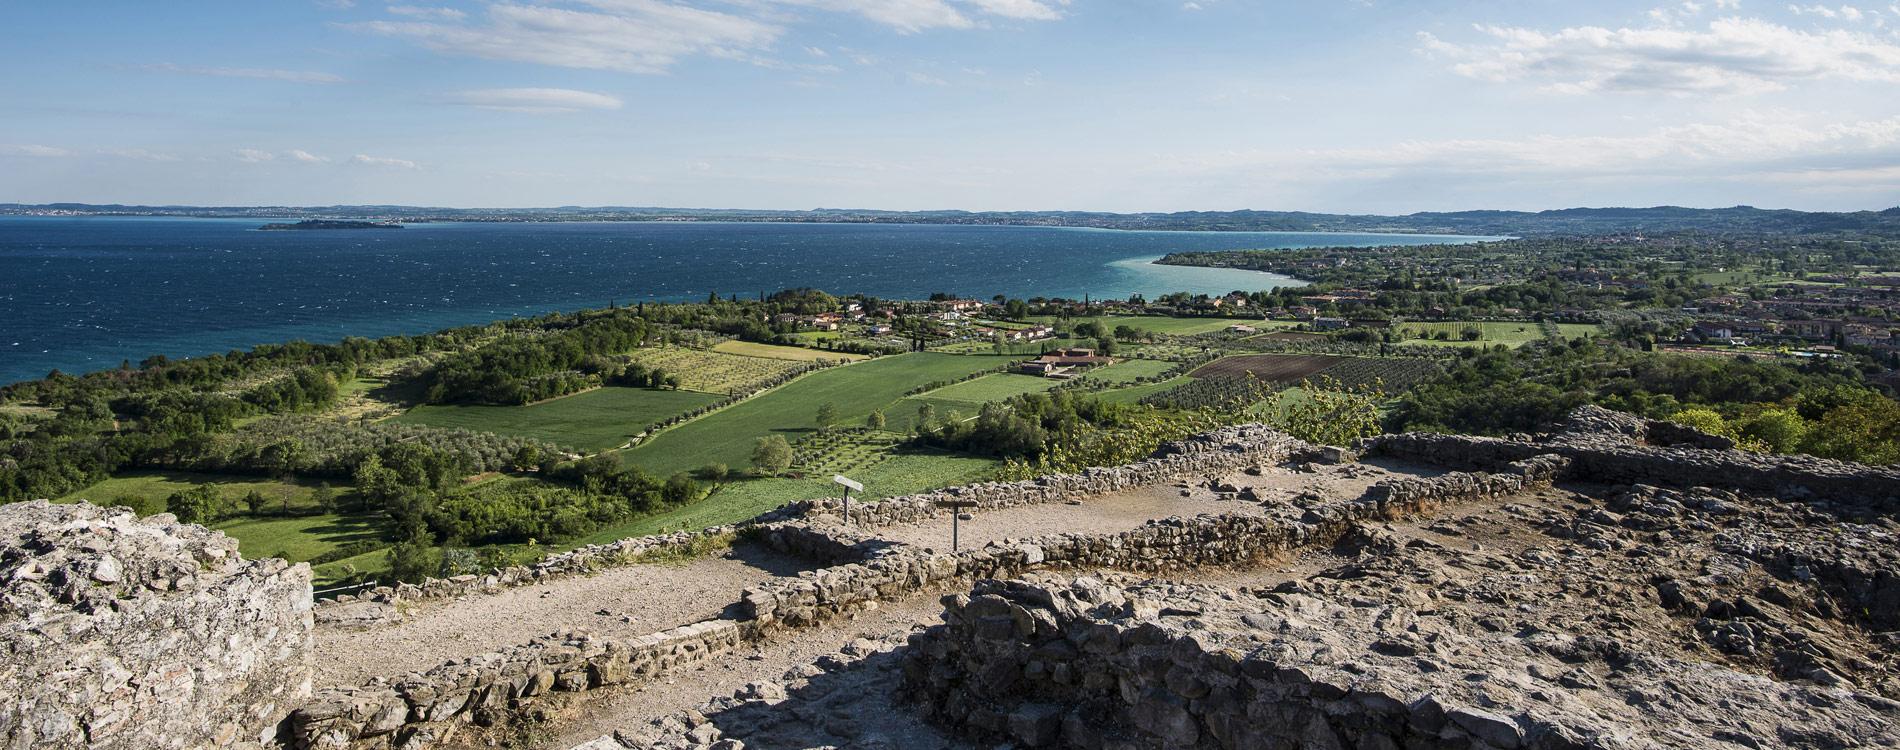 Manerba Sul Lago Di Garda